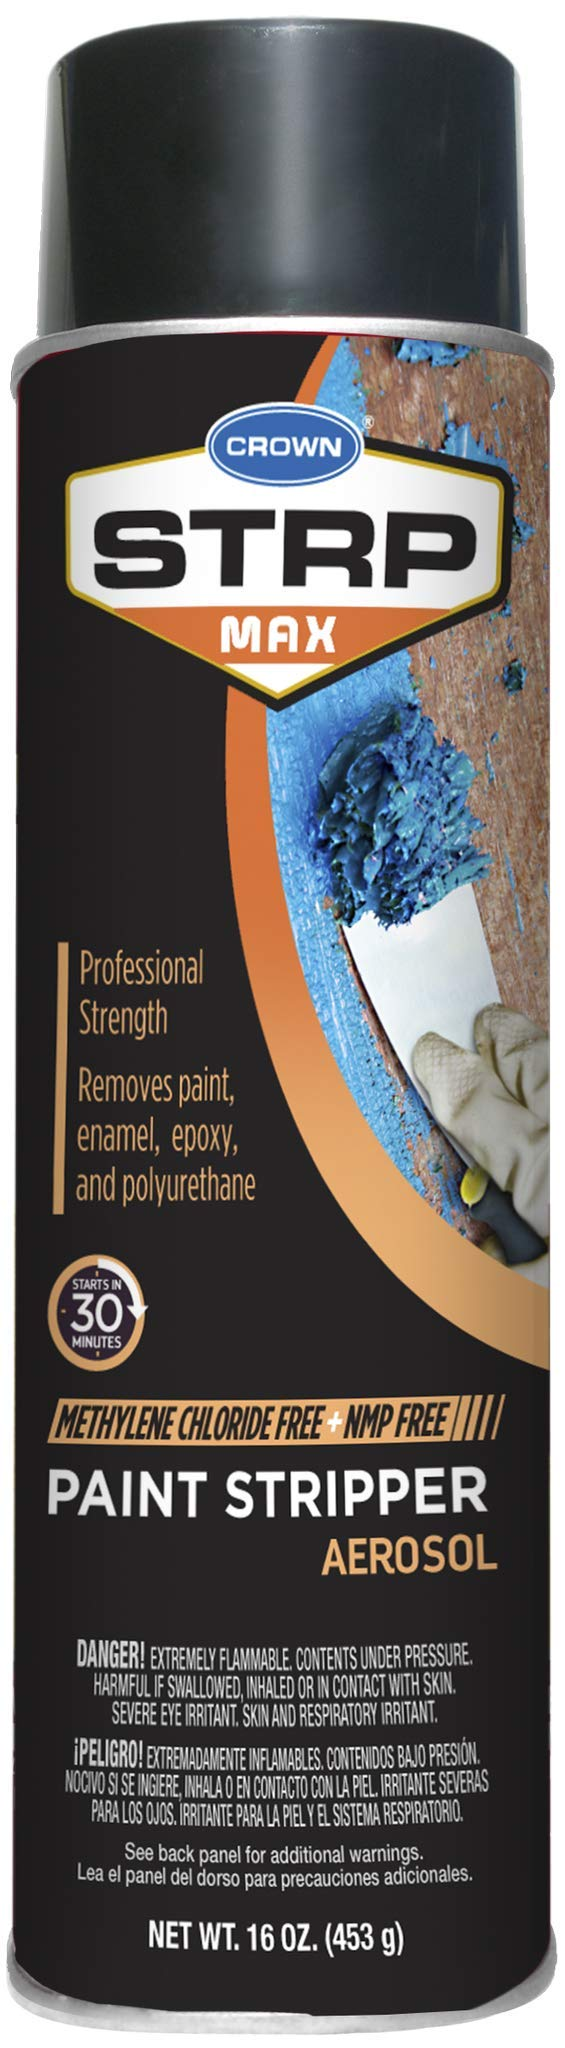 Crown STRP Max Professional Strength Aerosol Paint Stripper